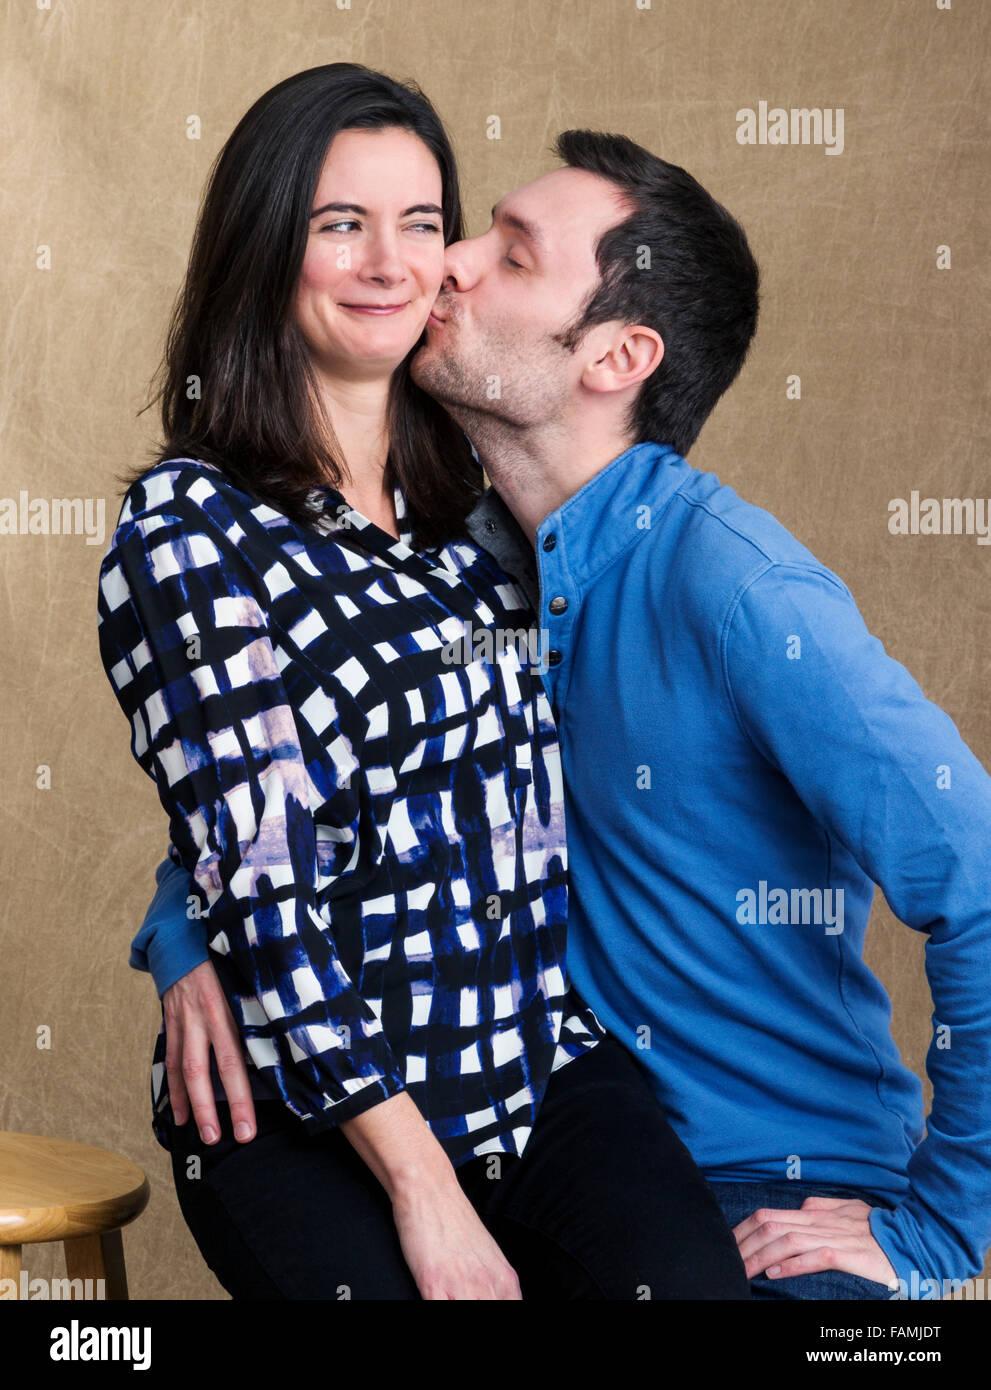 Retrato de estudio de humor joven pareja besándose Imagen De Stock